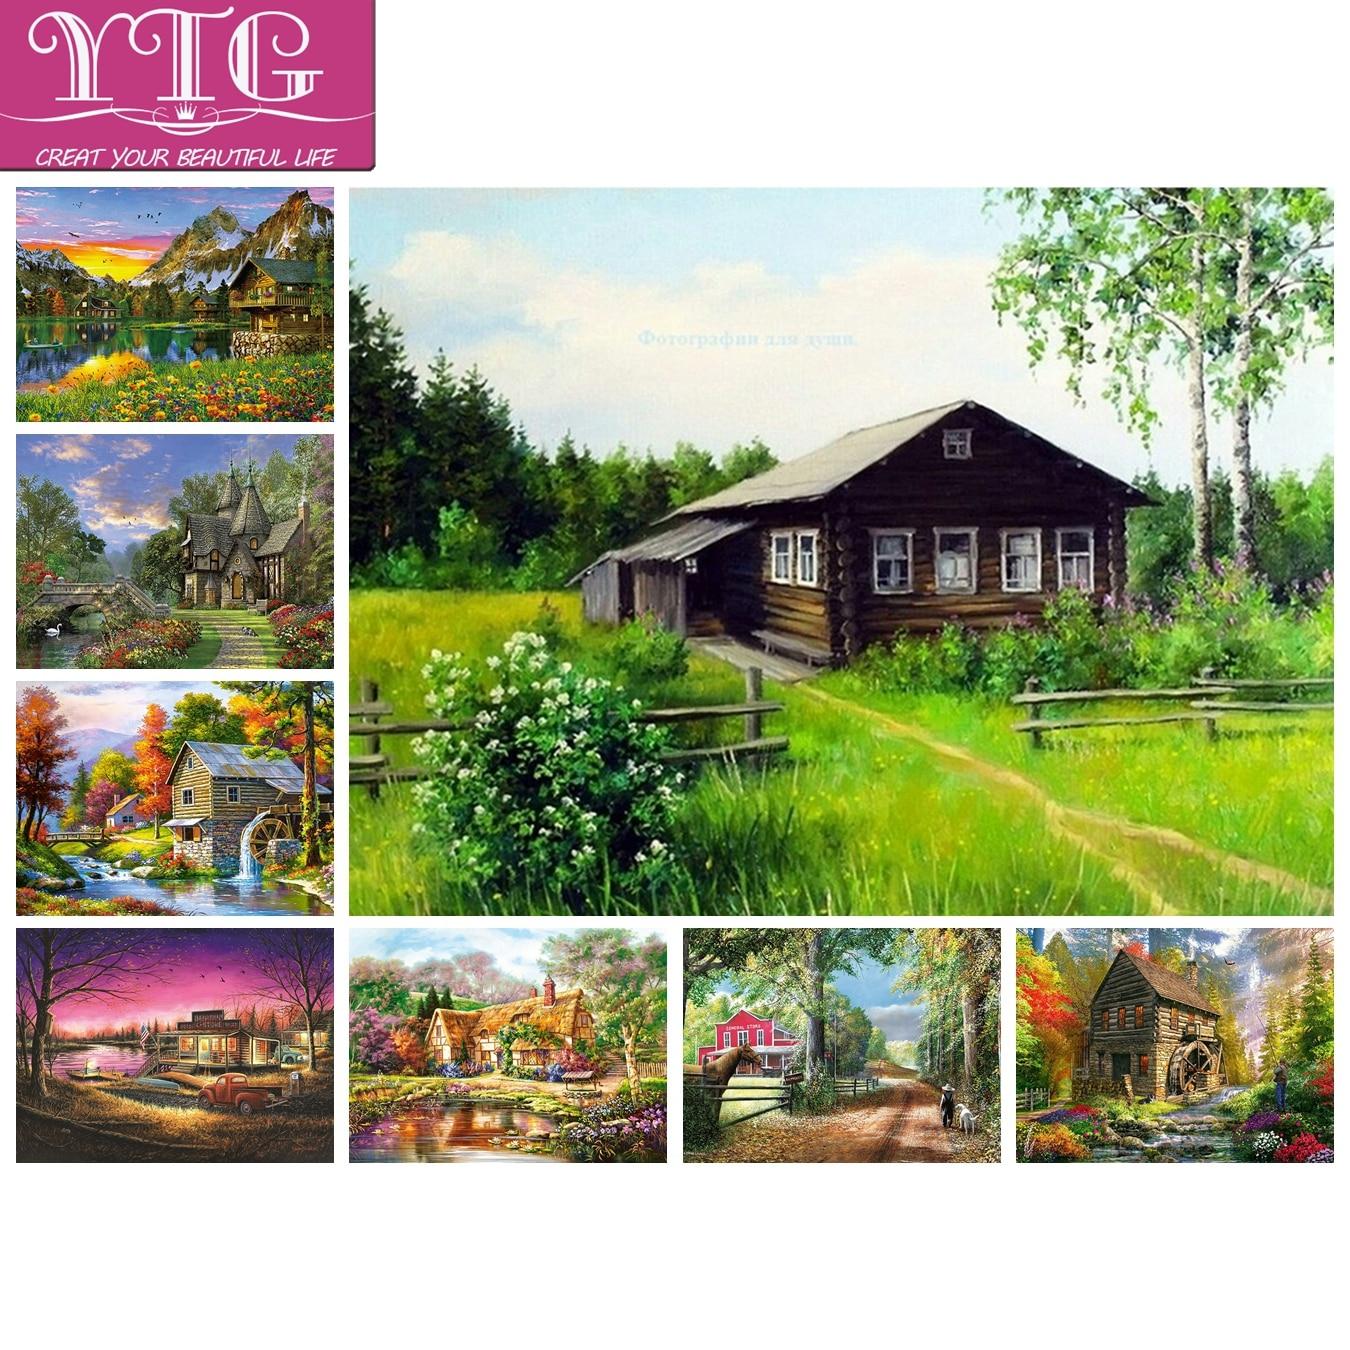 Full,Diamond Painting,Rural,Scenery,Diamond Embroidery,Cross Stitch,5D,Wall,Round,Rhinestone,Mosaic,Kits,DIY,Home Decor,Gift,Art